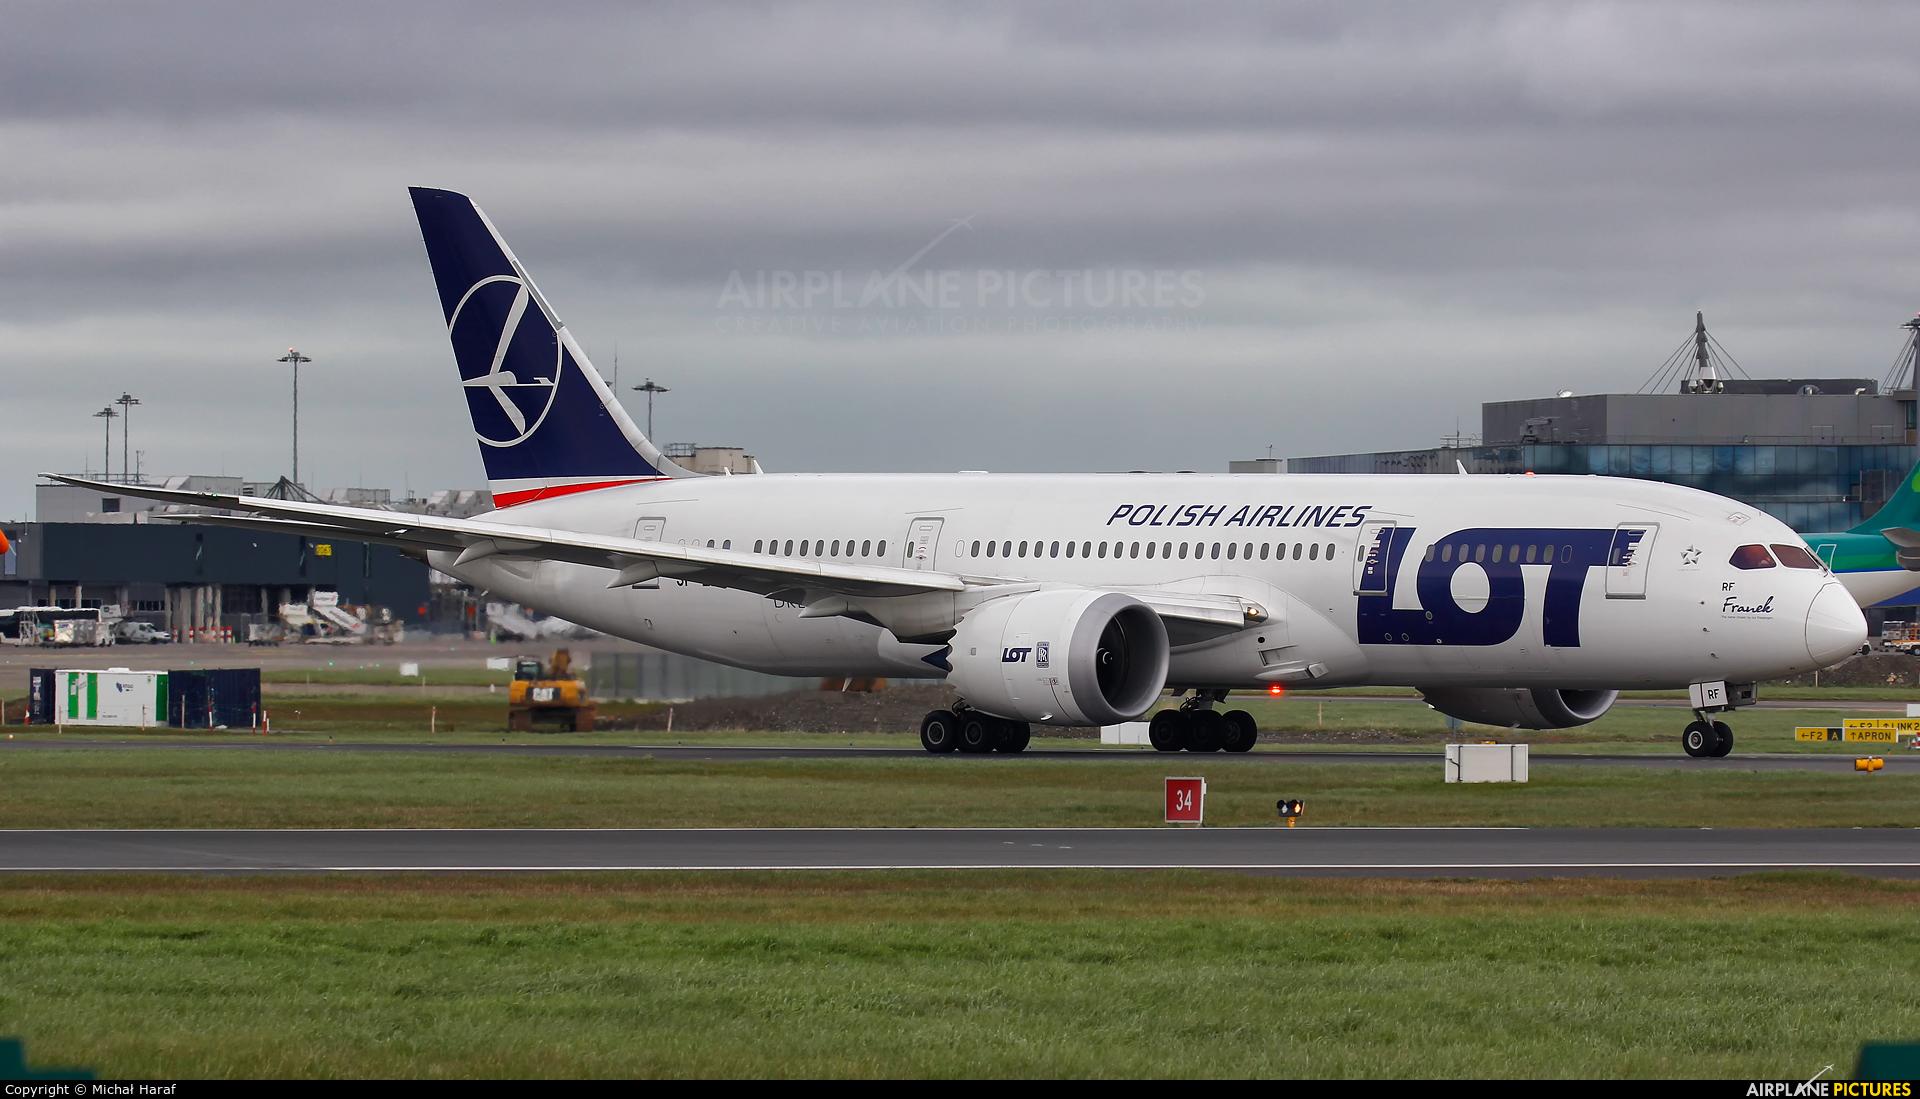 LOT - Polish Airlines SP-LRF aircraft at Dublin